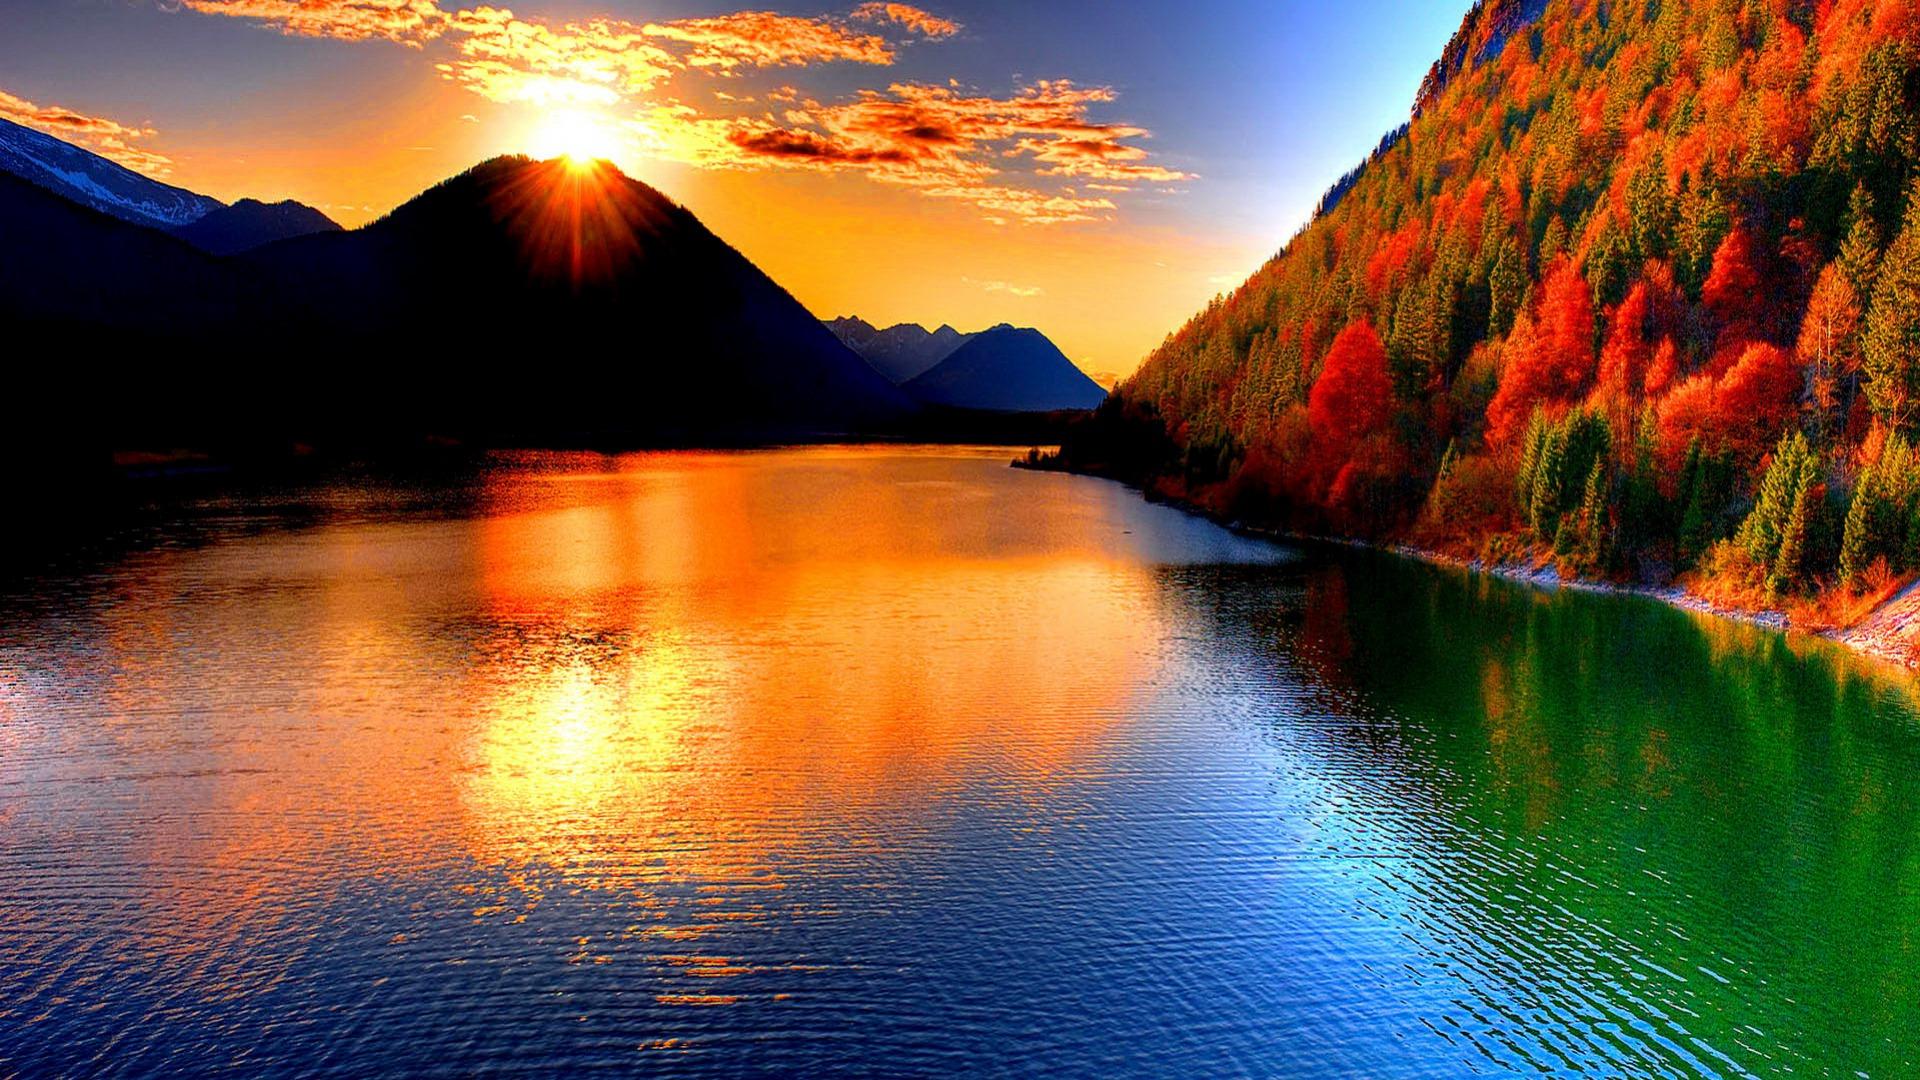 beautiful wallpaper sunset river